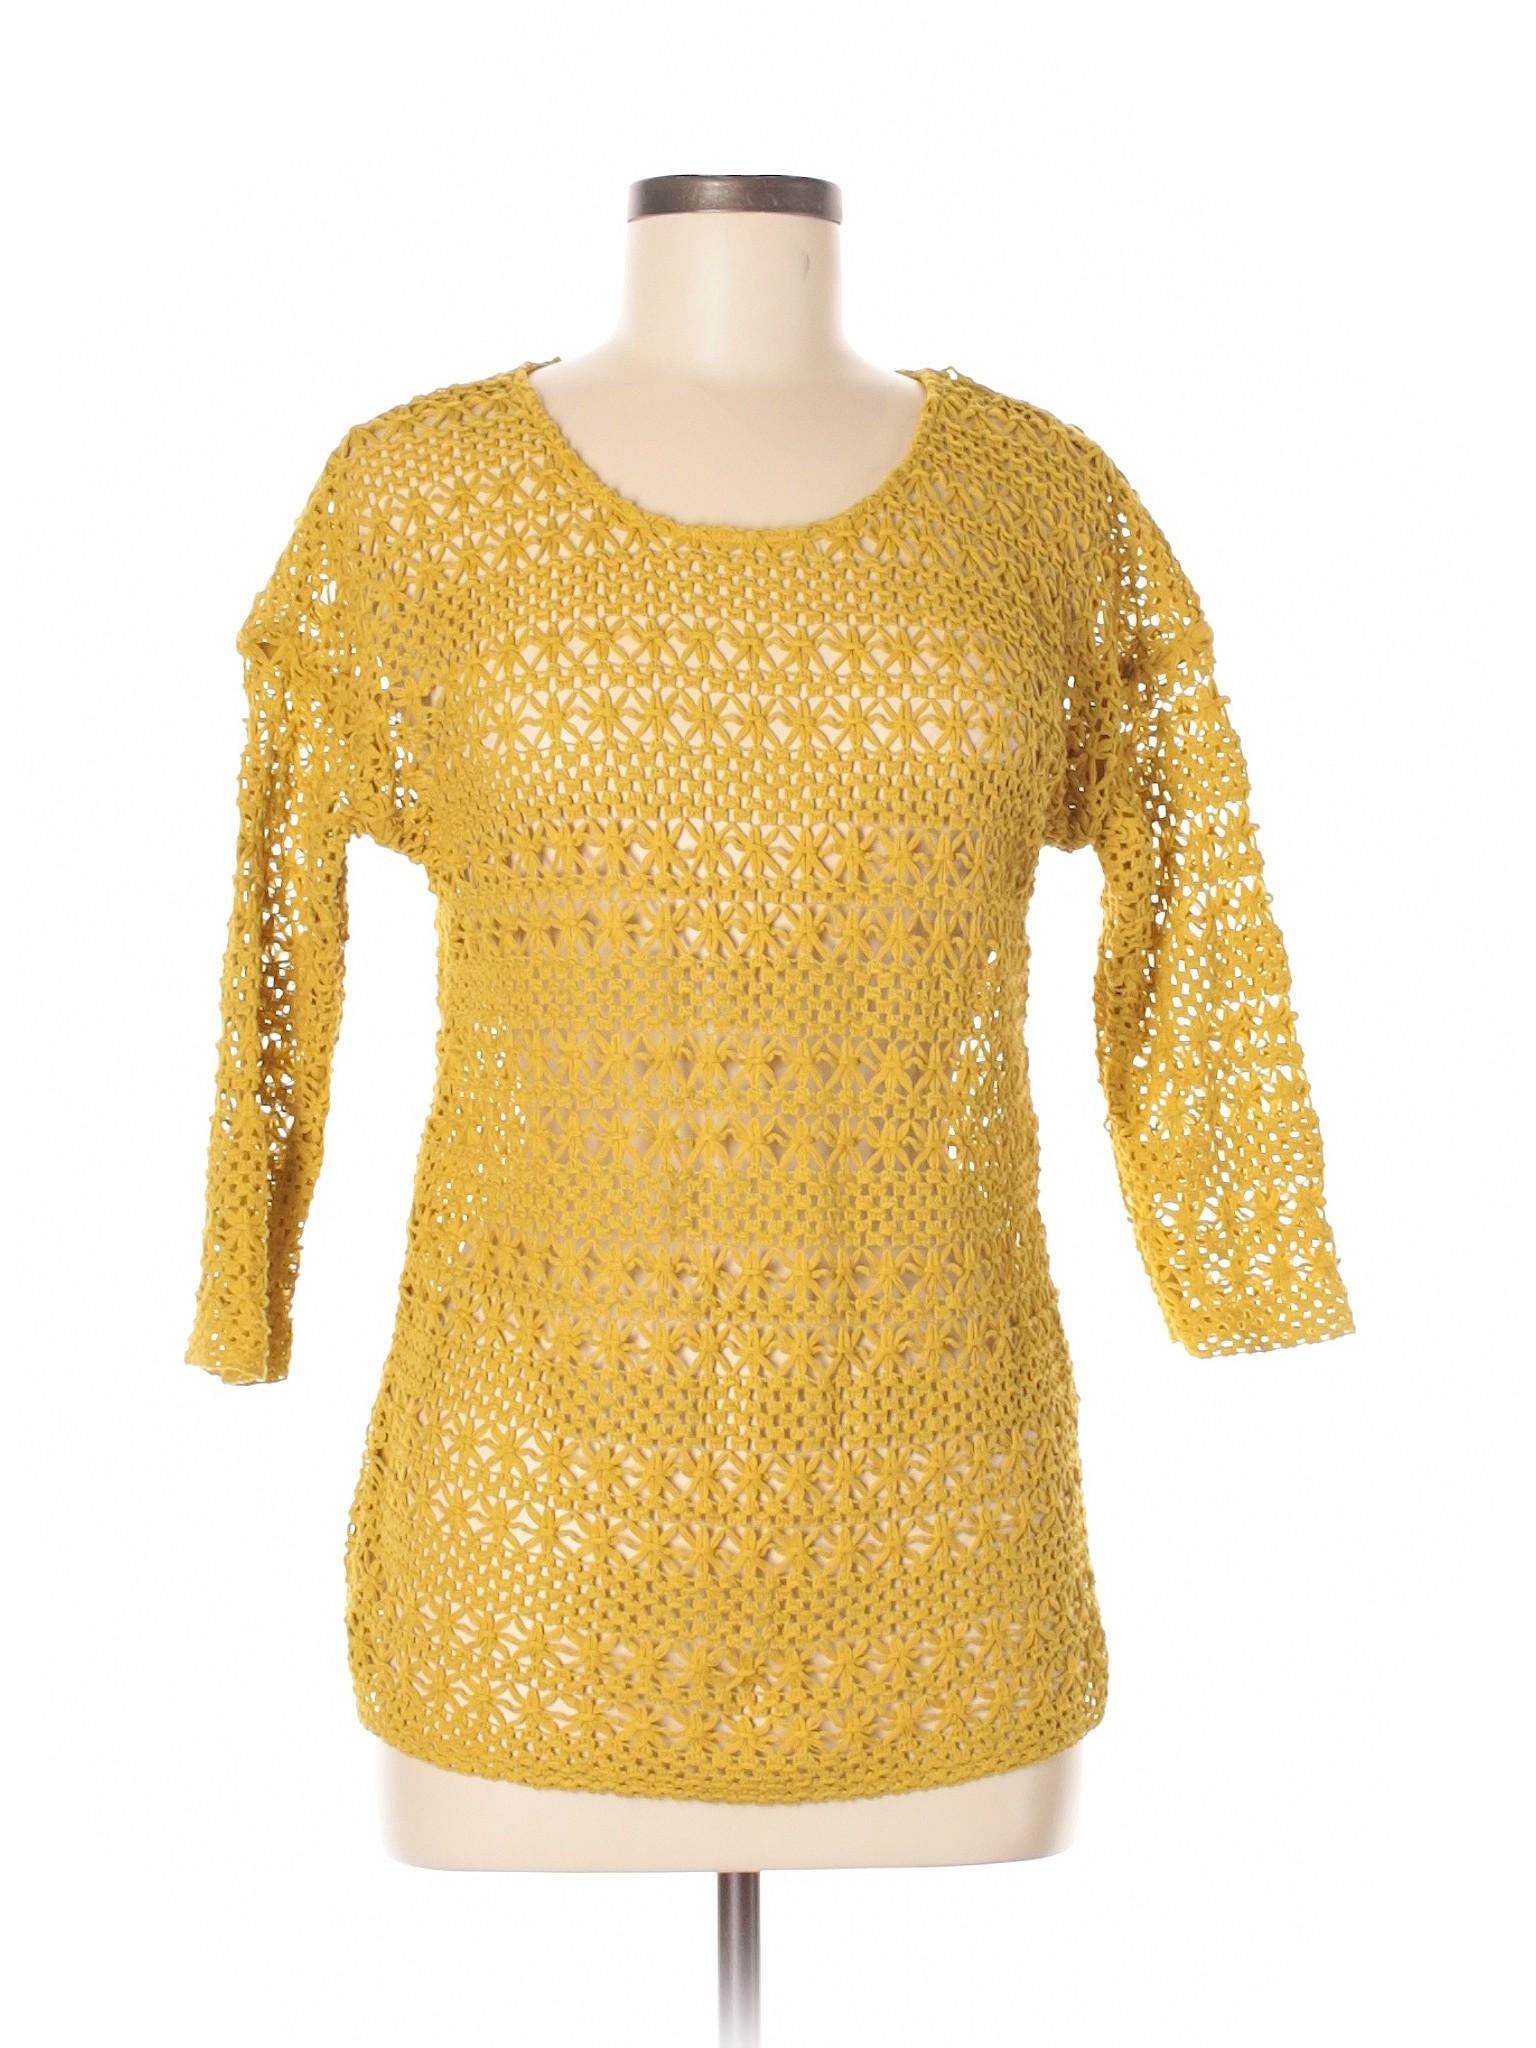 Sweater Boutique Boutique Pullover Boutique Next Next Next Sweater Sweater Boutique Pullover Next Pullover qU7BOq